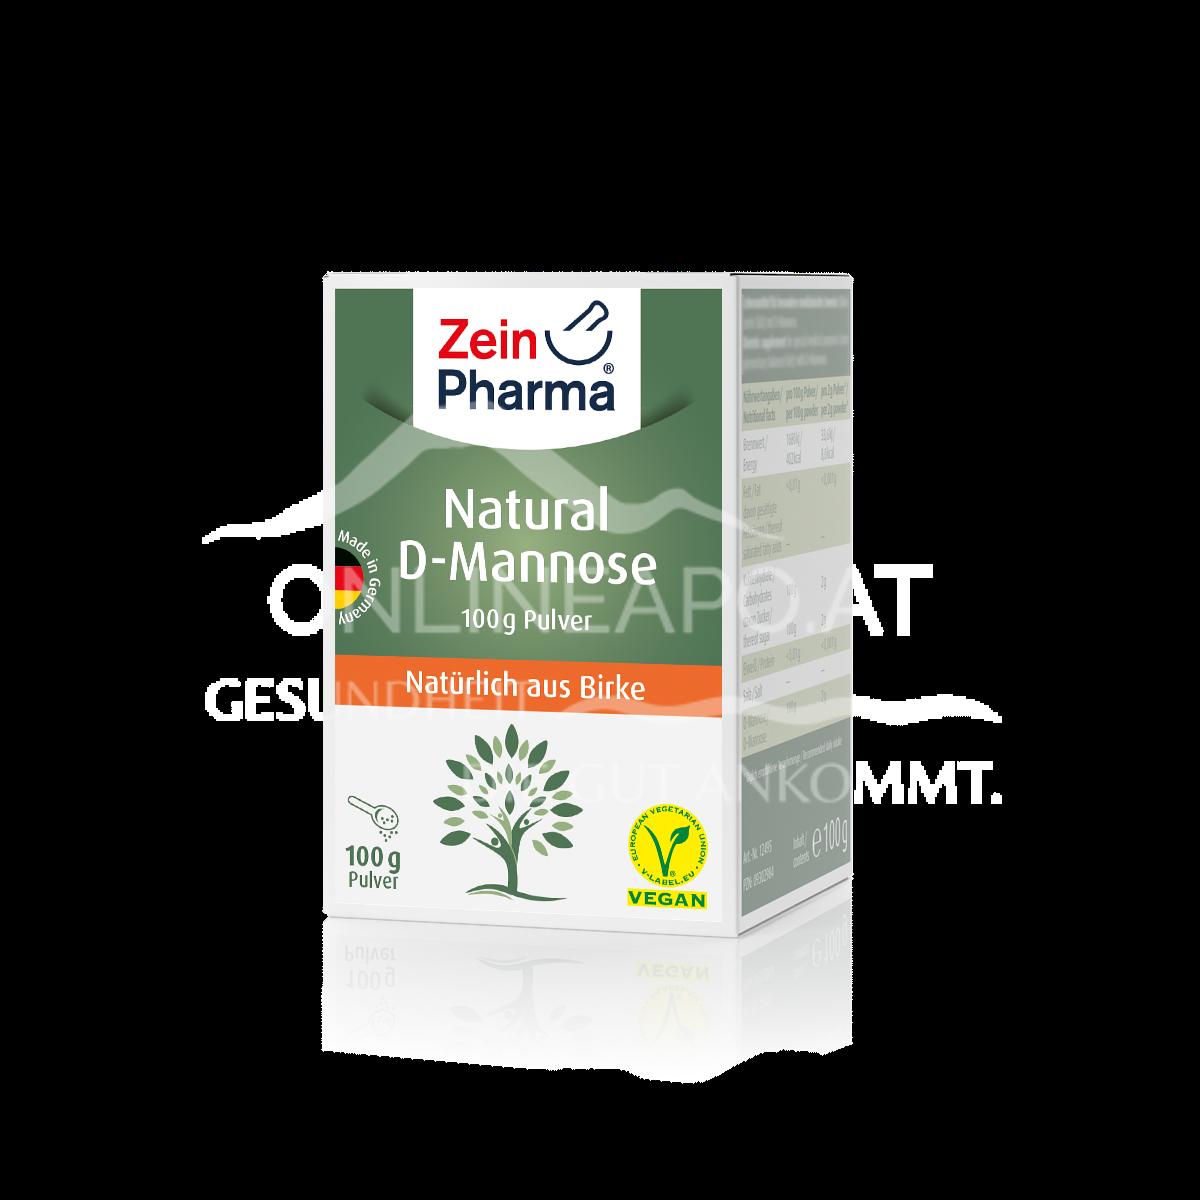 Zeinpharma D-Mannose Pulver